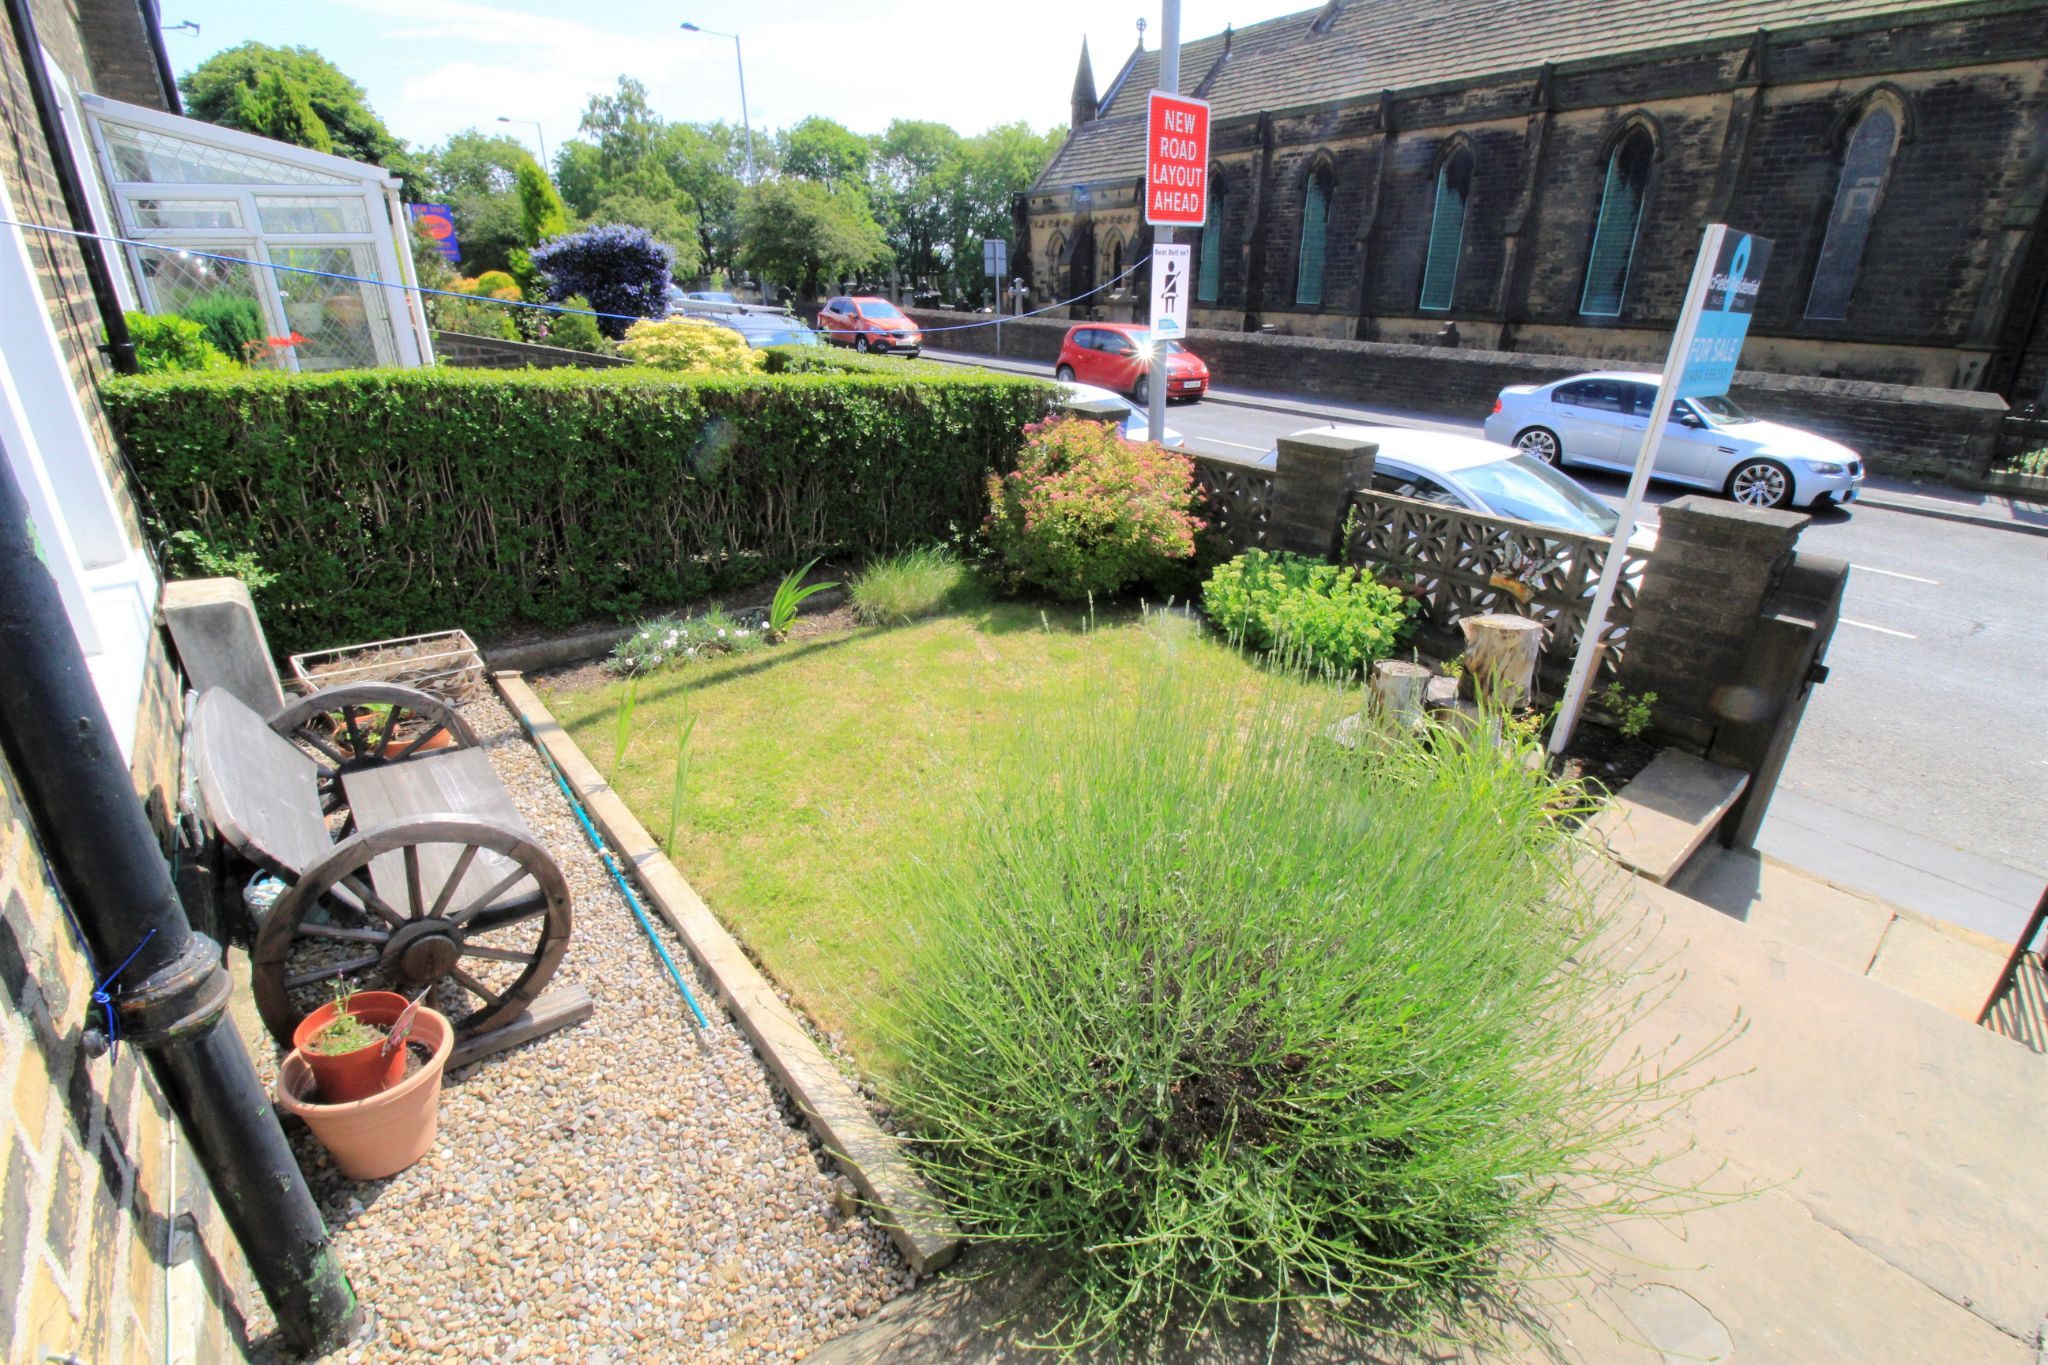 3 bedroom mid terraced house SSTC in Bradford - Front garden